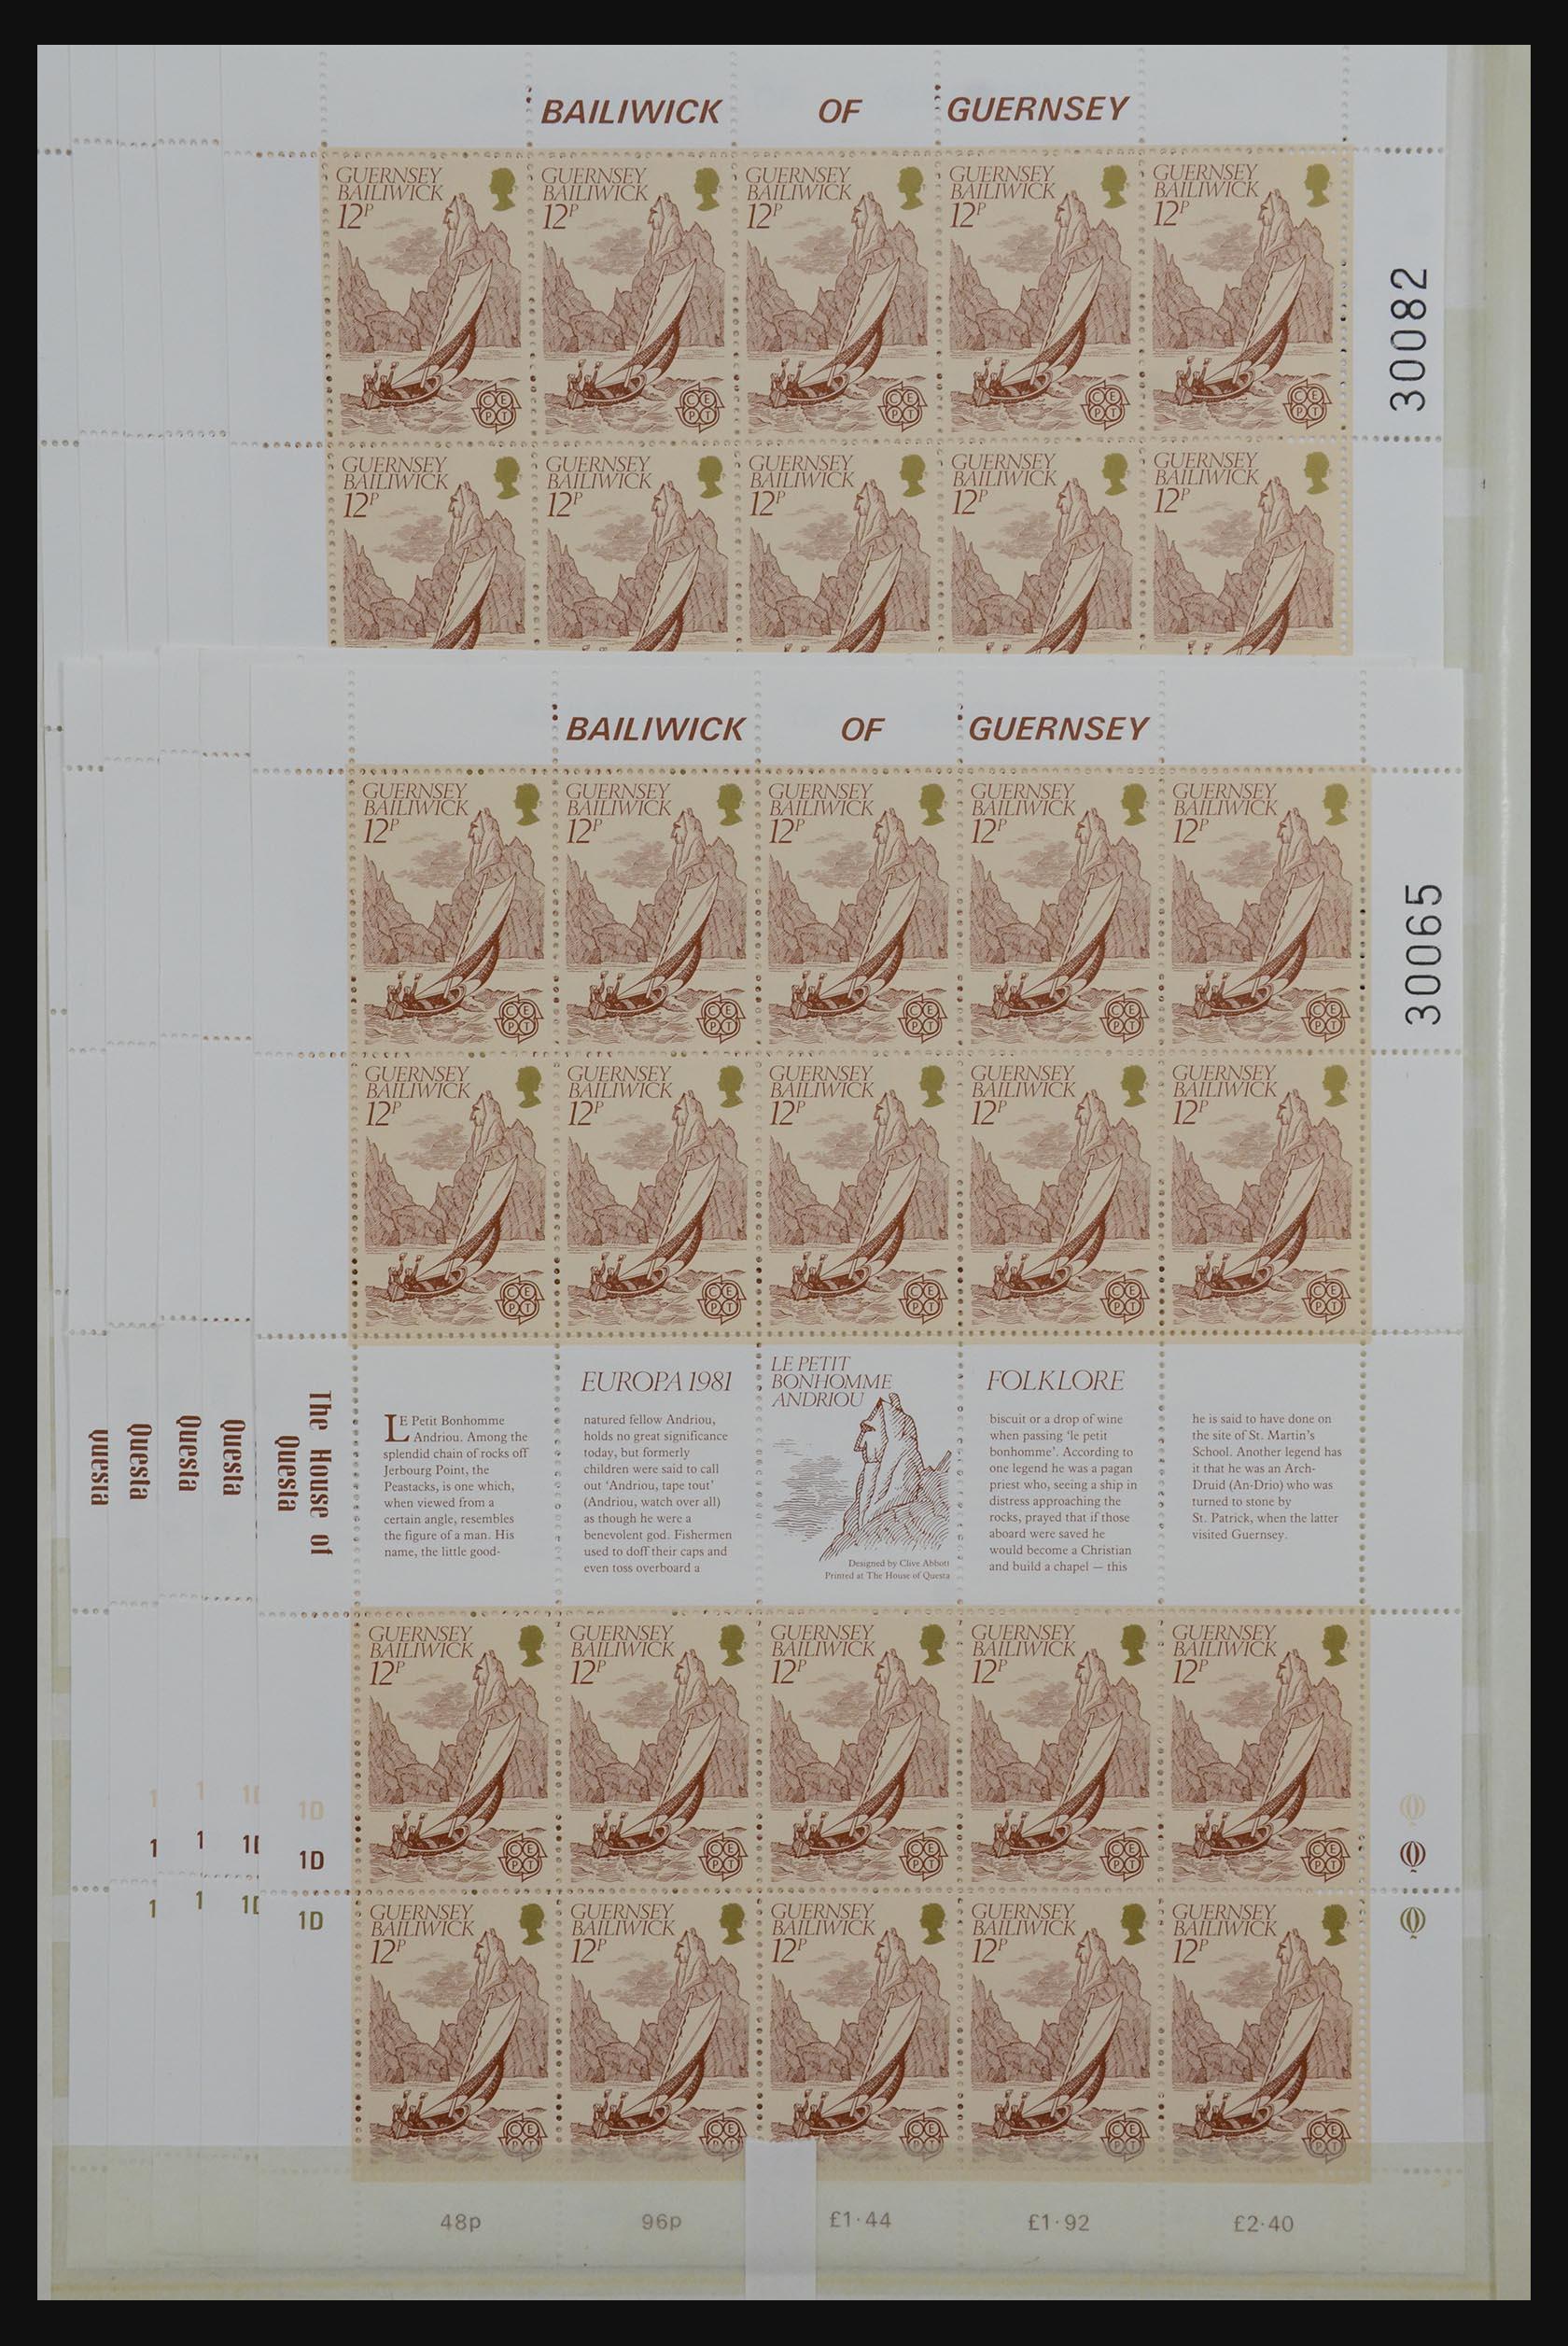 32180 020 - 32180 Guernsey 1972-1992.